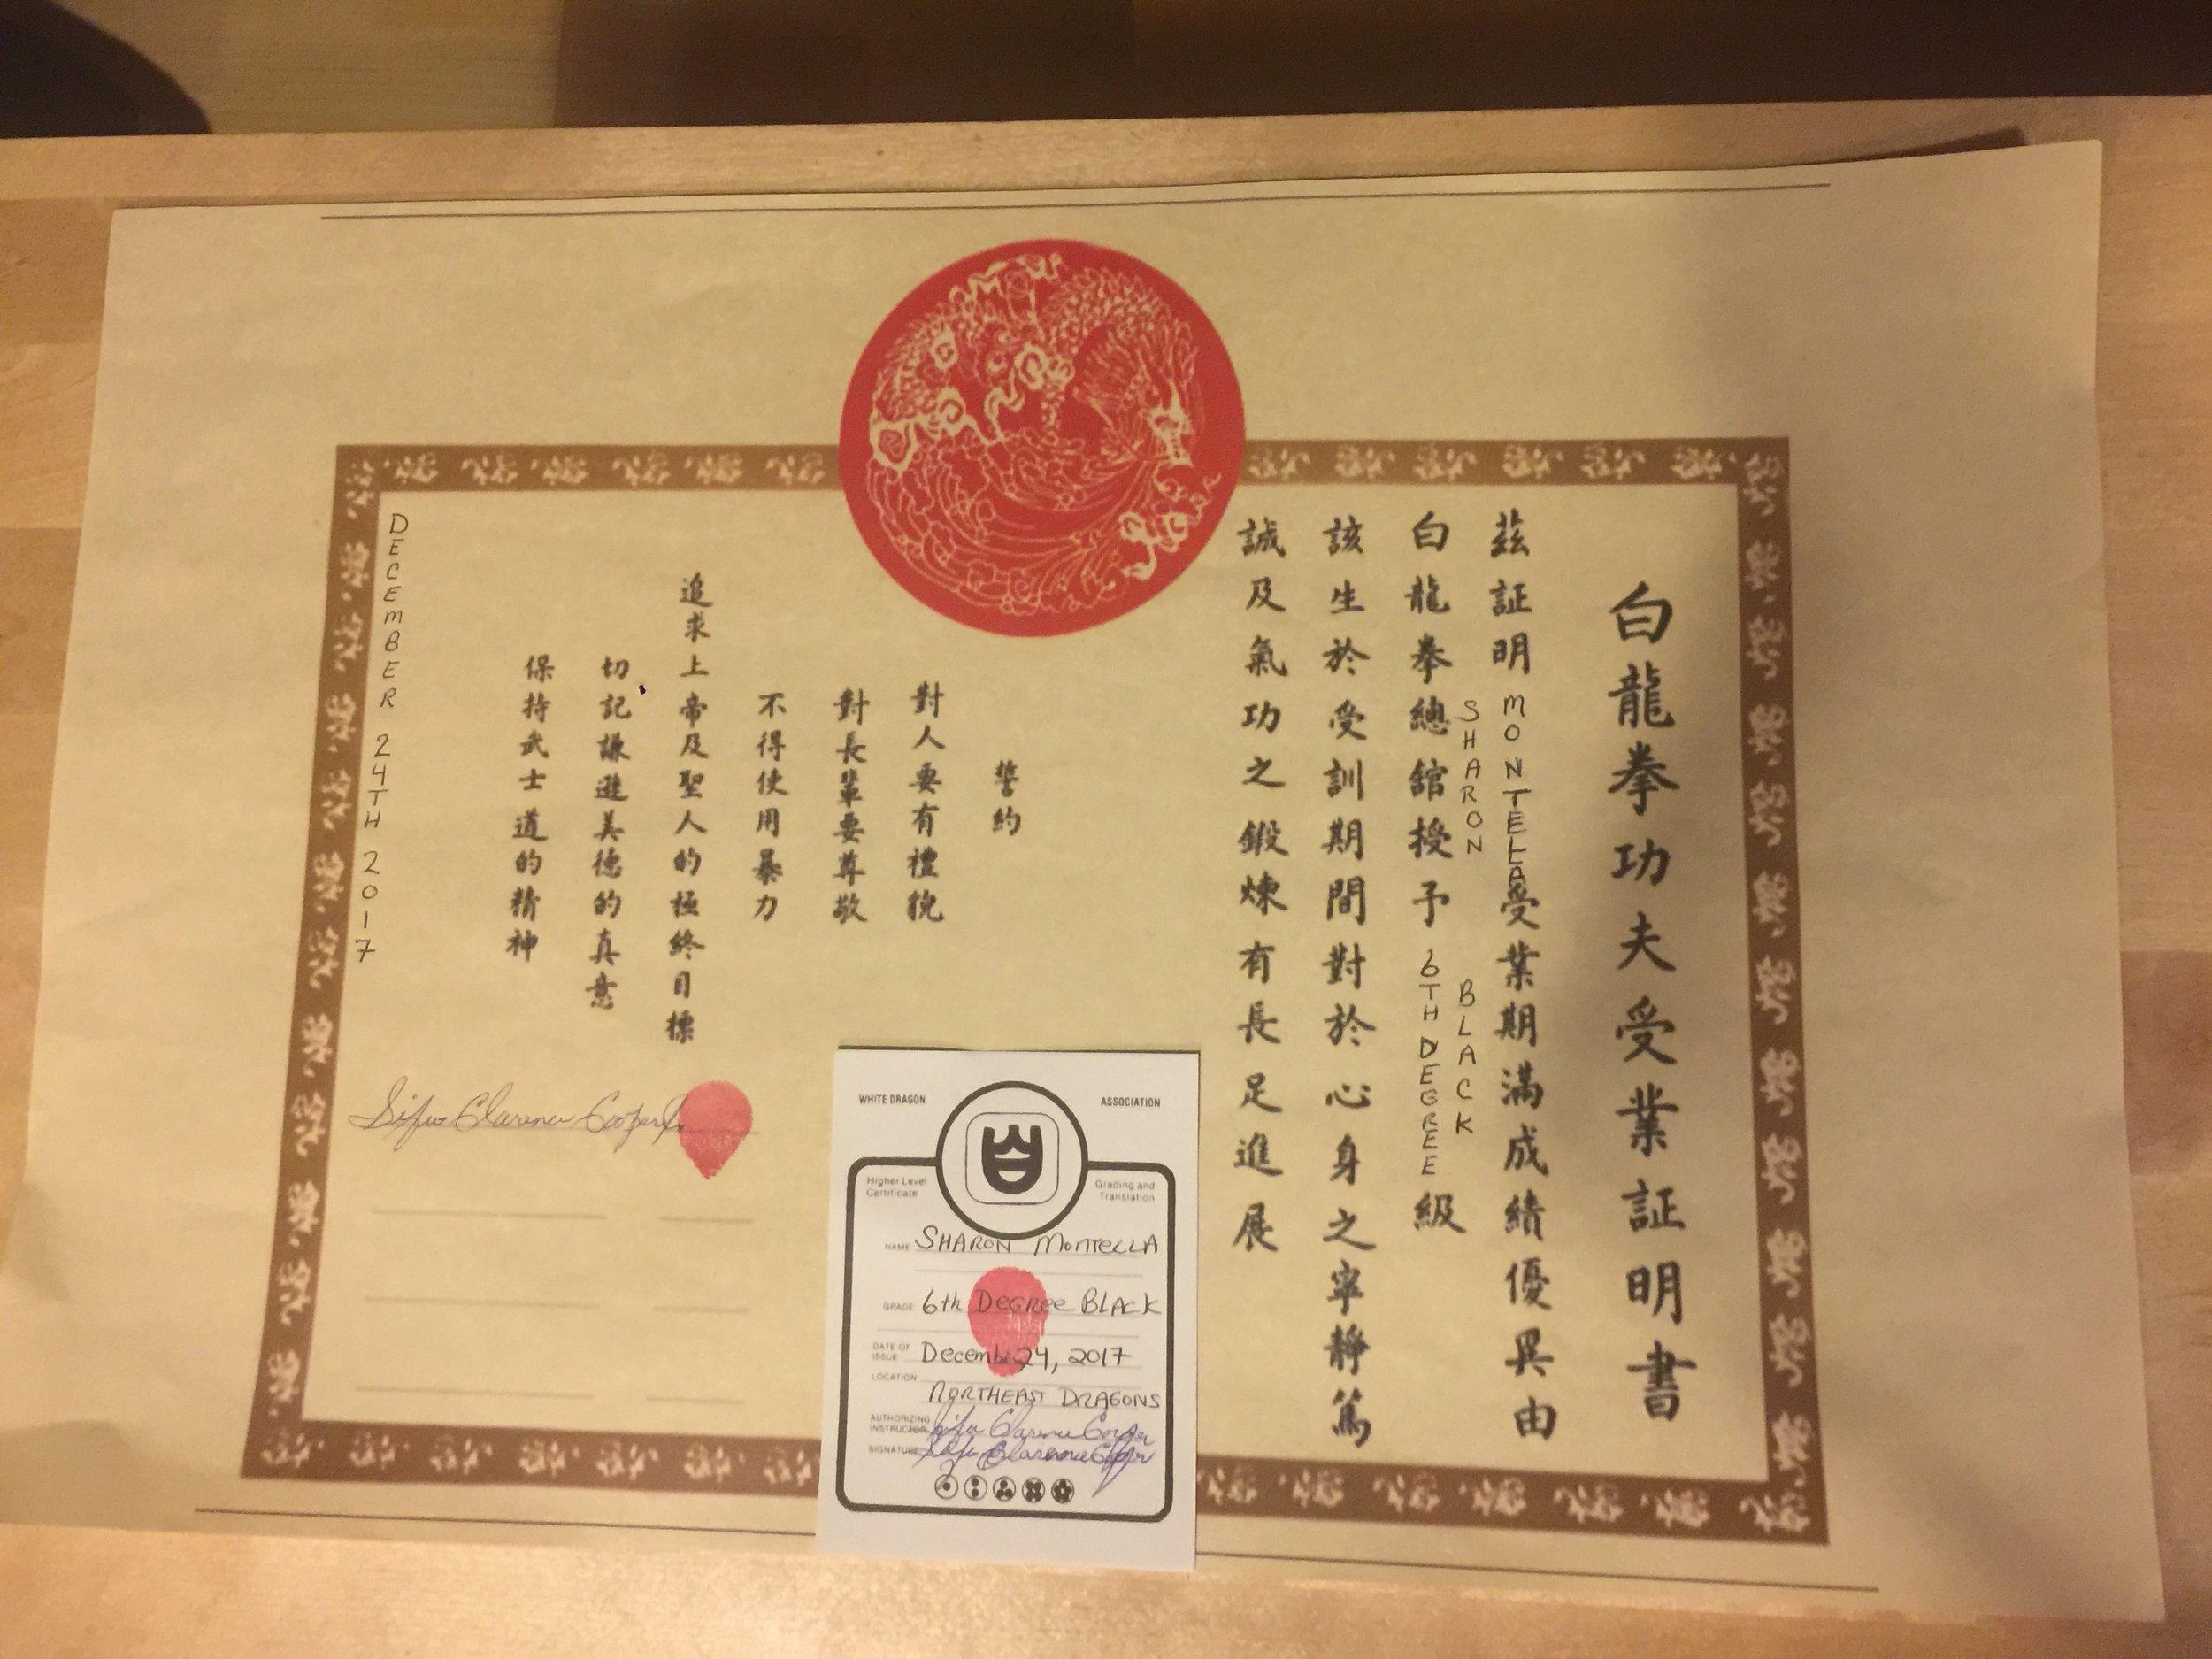 6th Degree Black Belt Certificate - Northeast Dragons Pai Lum - Sifu Sharon Montella.jpg